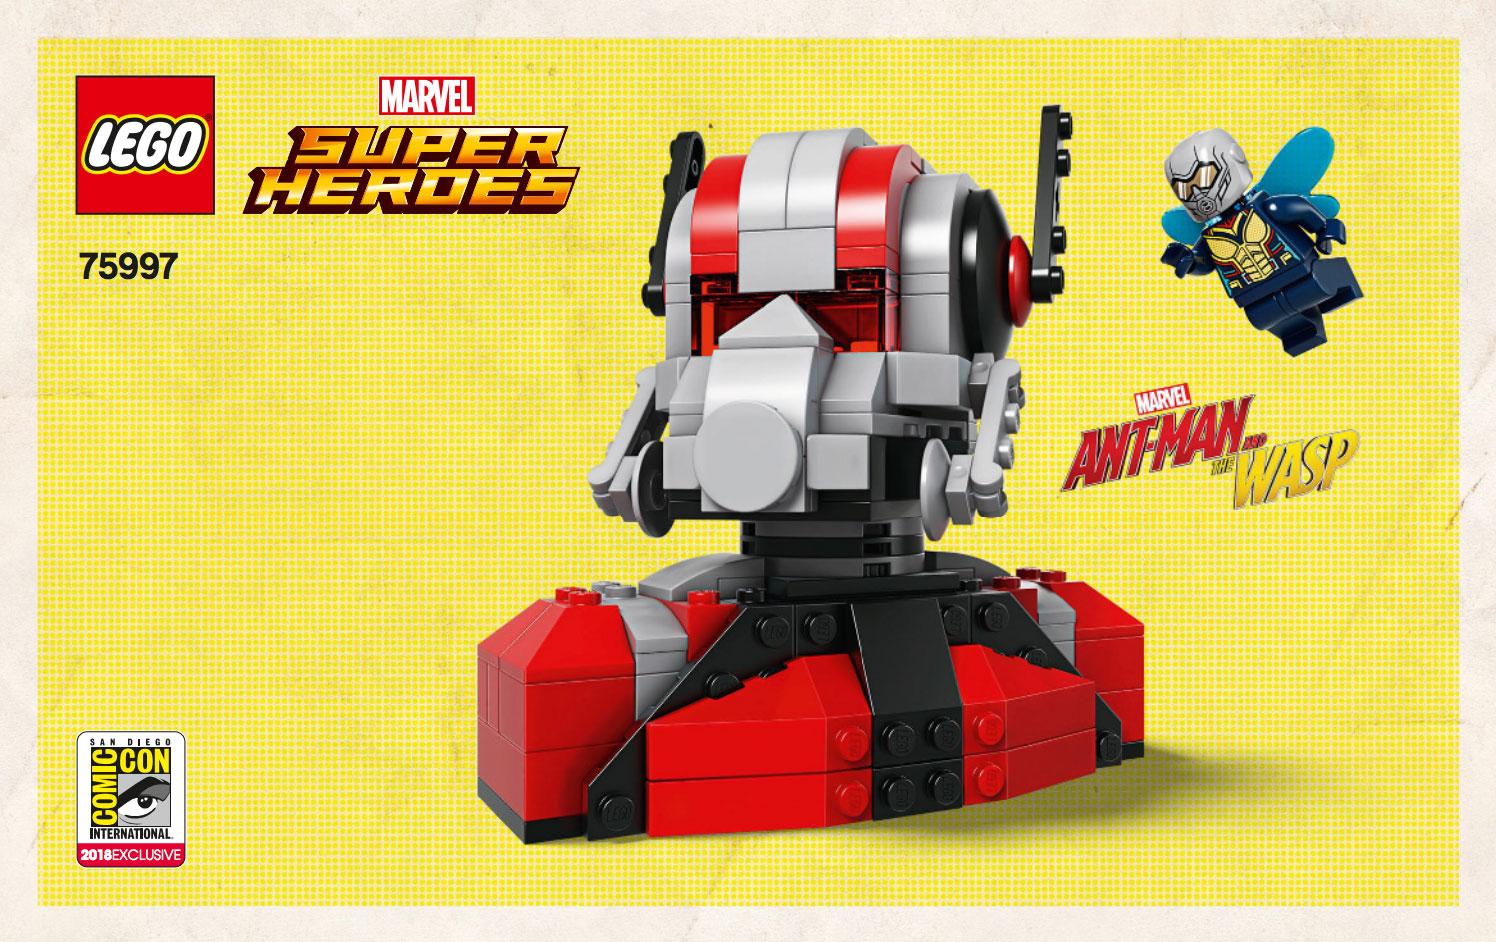 Brickfinder - SDCC Exclusive LEGO Instructions Released!